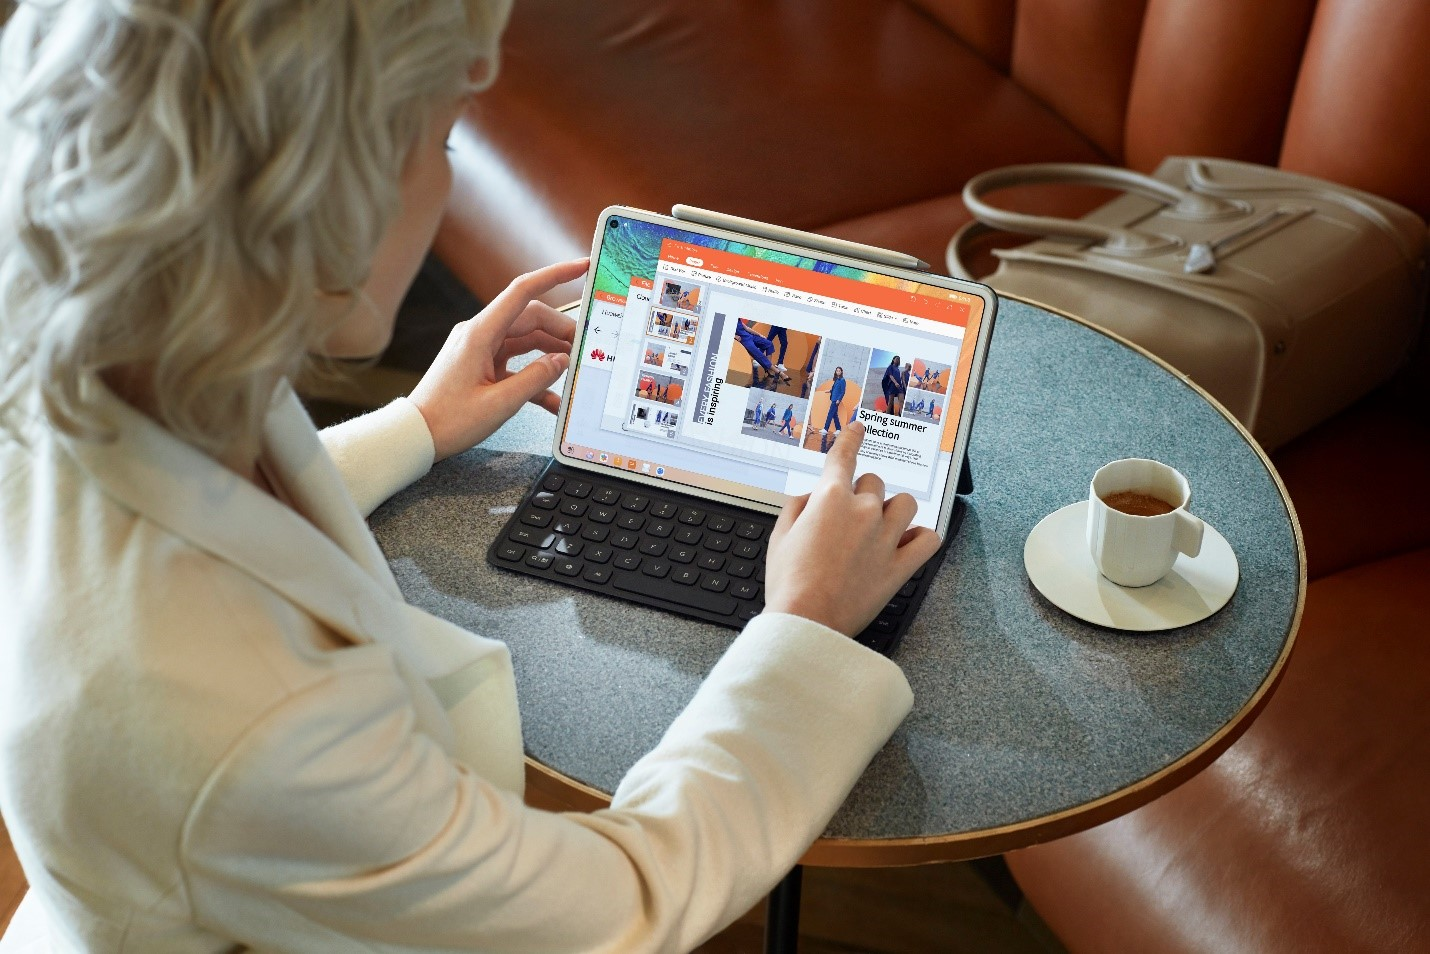 HUAWEI MatePad Pro Bundle Promotion Starting 29 April 2020 till 7 June 2020